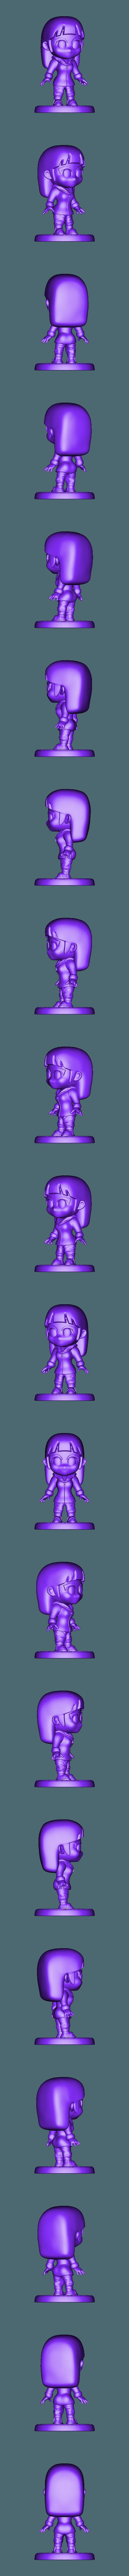 Hinata.OBJ Descargar archivo OBJ HINATA Hyuga Chibi • Modelo imprimible en 3D, MatteoMoscatelli